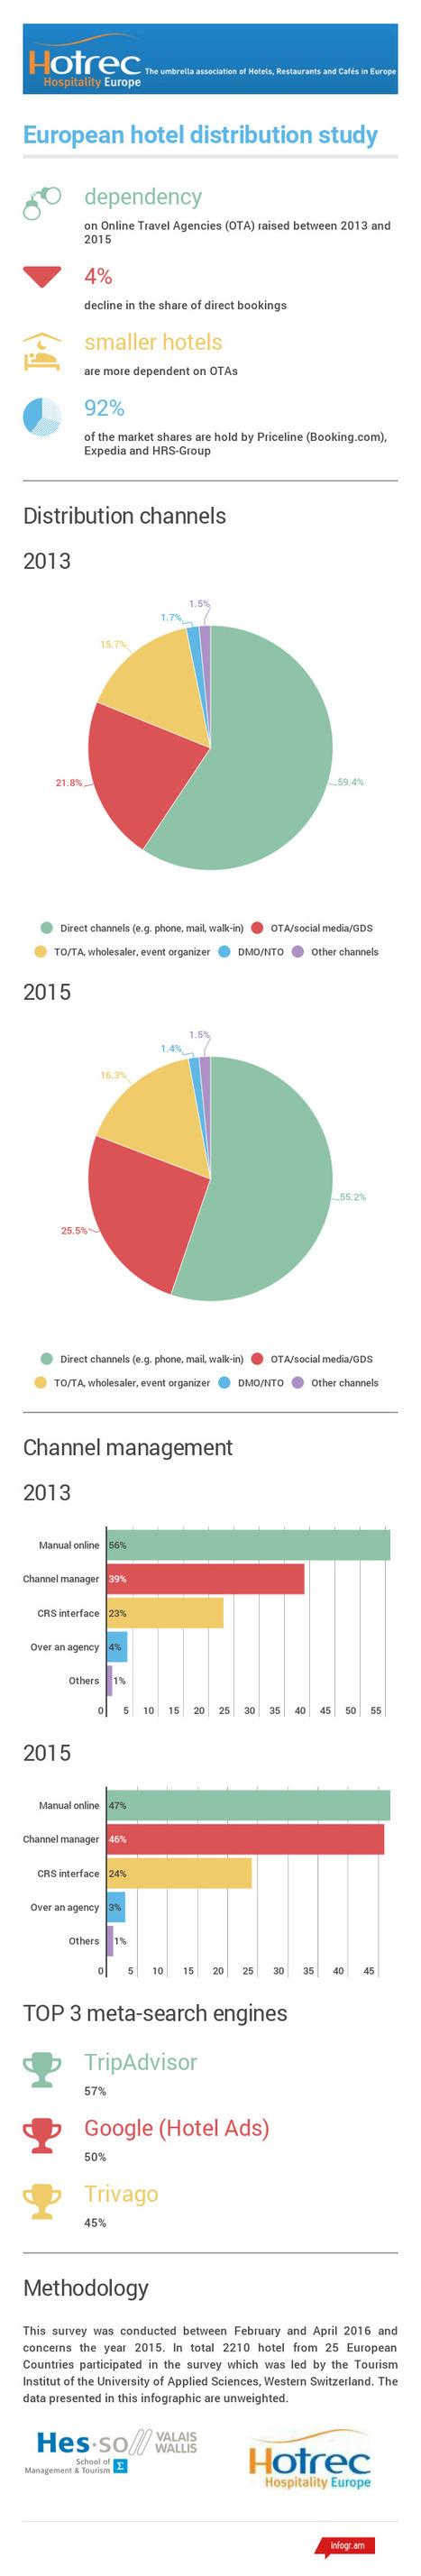 Hotrec-Studie: Buchungsportale werden noch mächtiger | eTourism Trends and News | Scoop.it